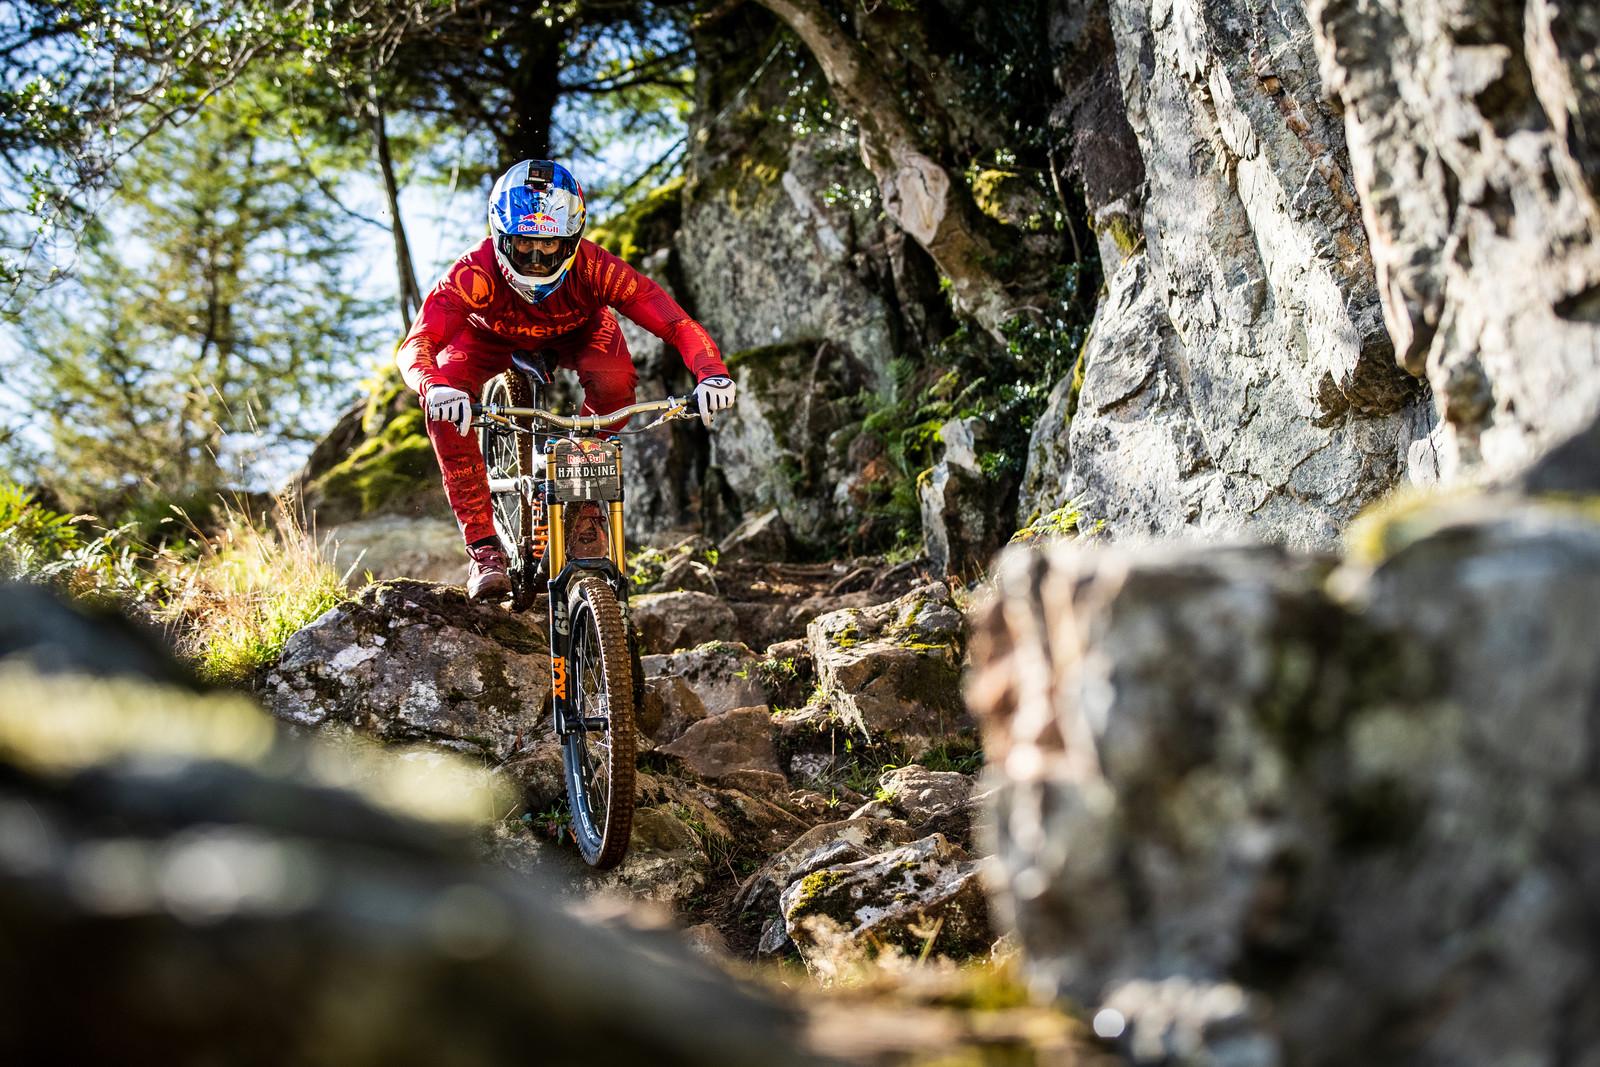 Gee Atherton - Red Bull Hardline in Photos - Mountain Biking Pictures - Vital MTB